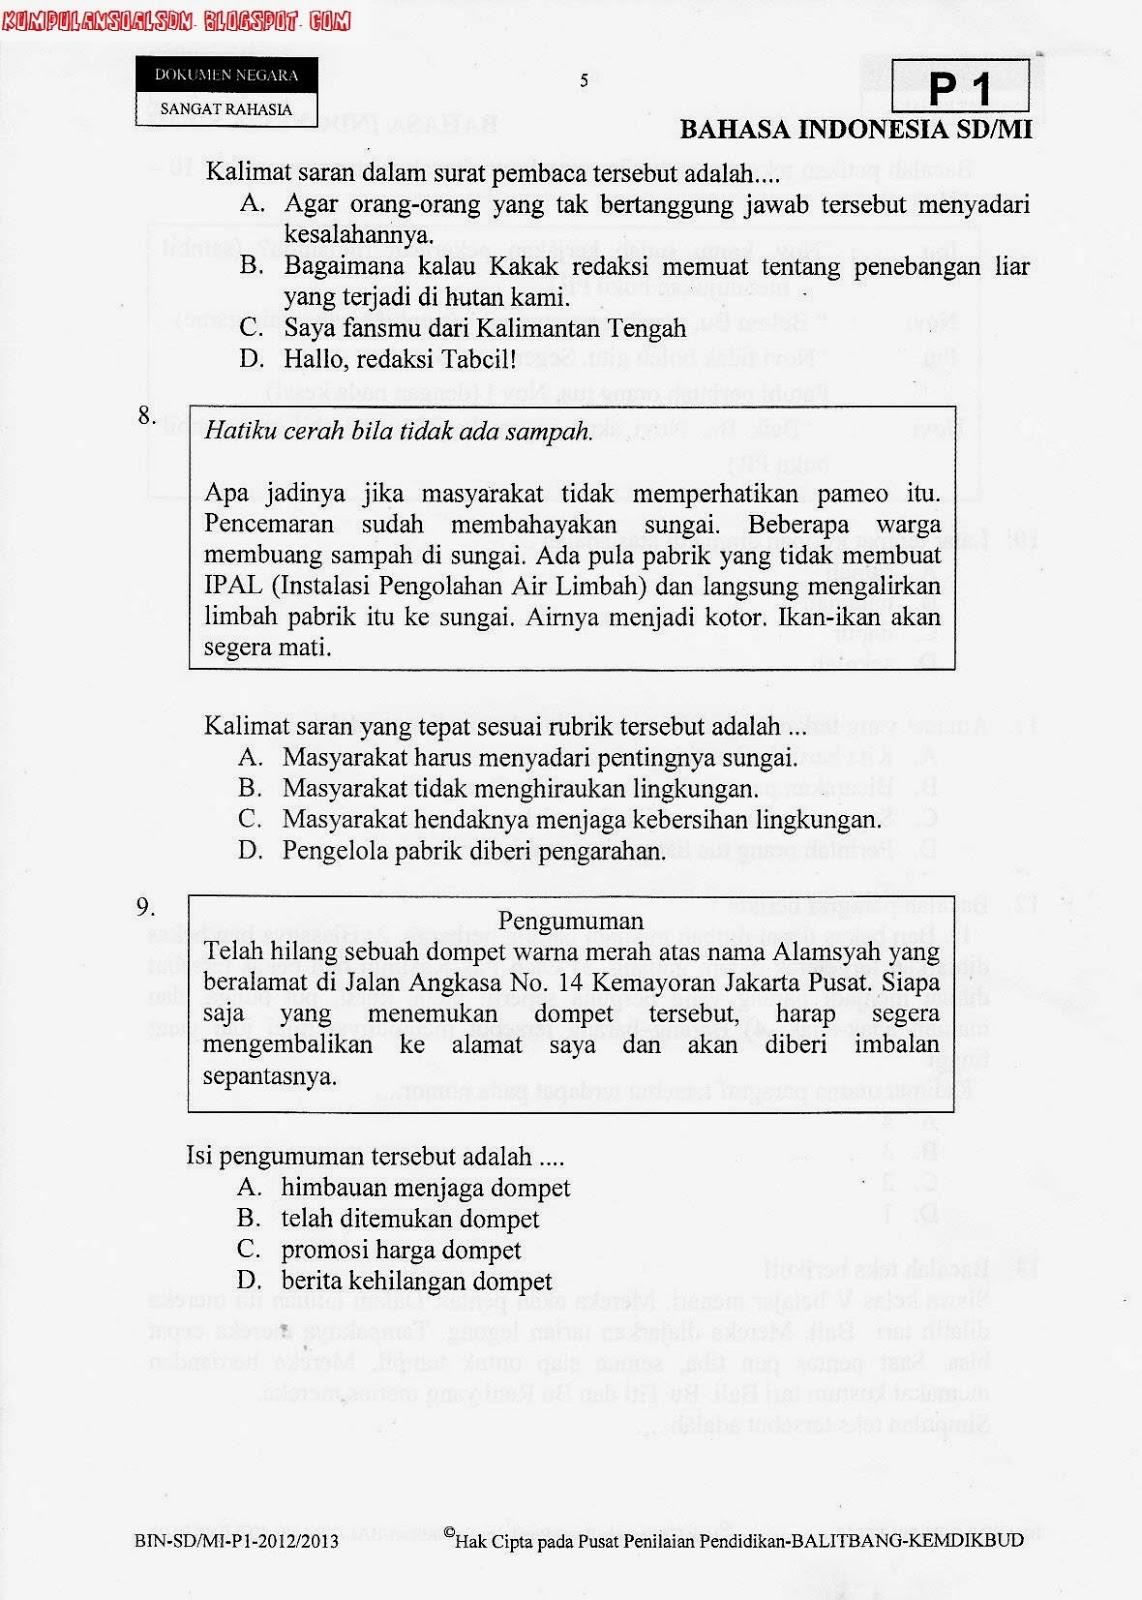 Soal Soal Bahasa Jawa Kelas 2 Semester Ganjil Tahun 2014 Newhairstylesformen2014 Com